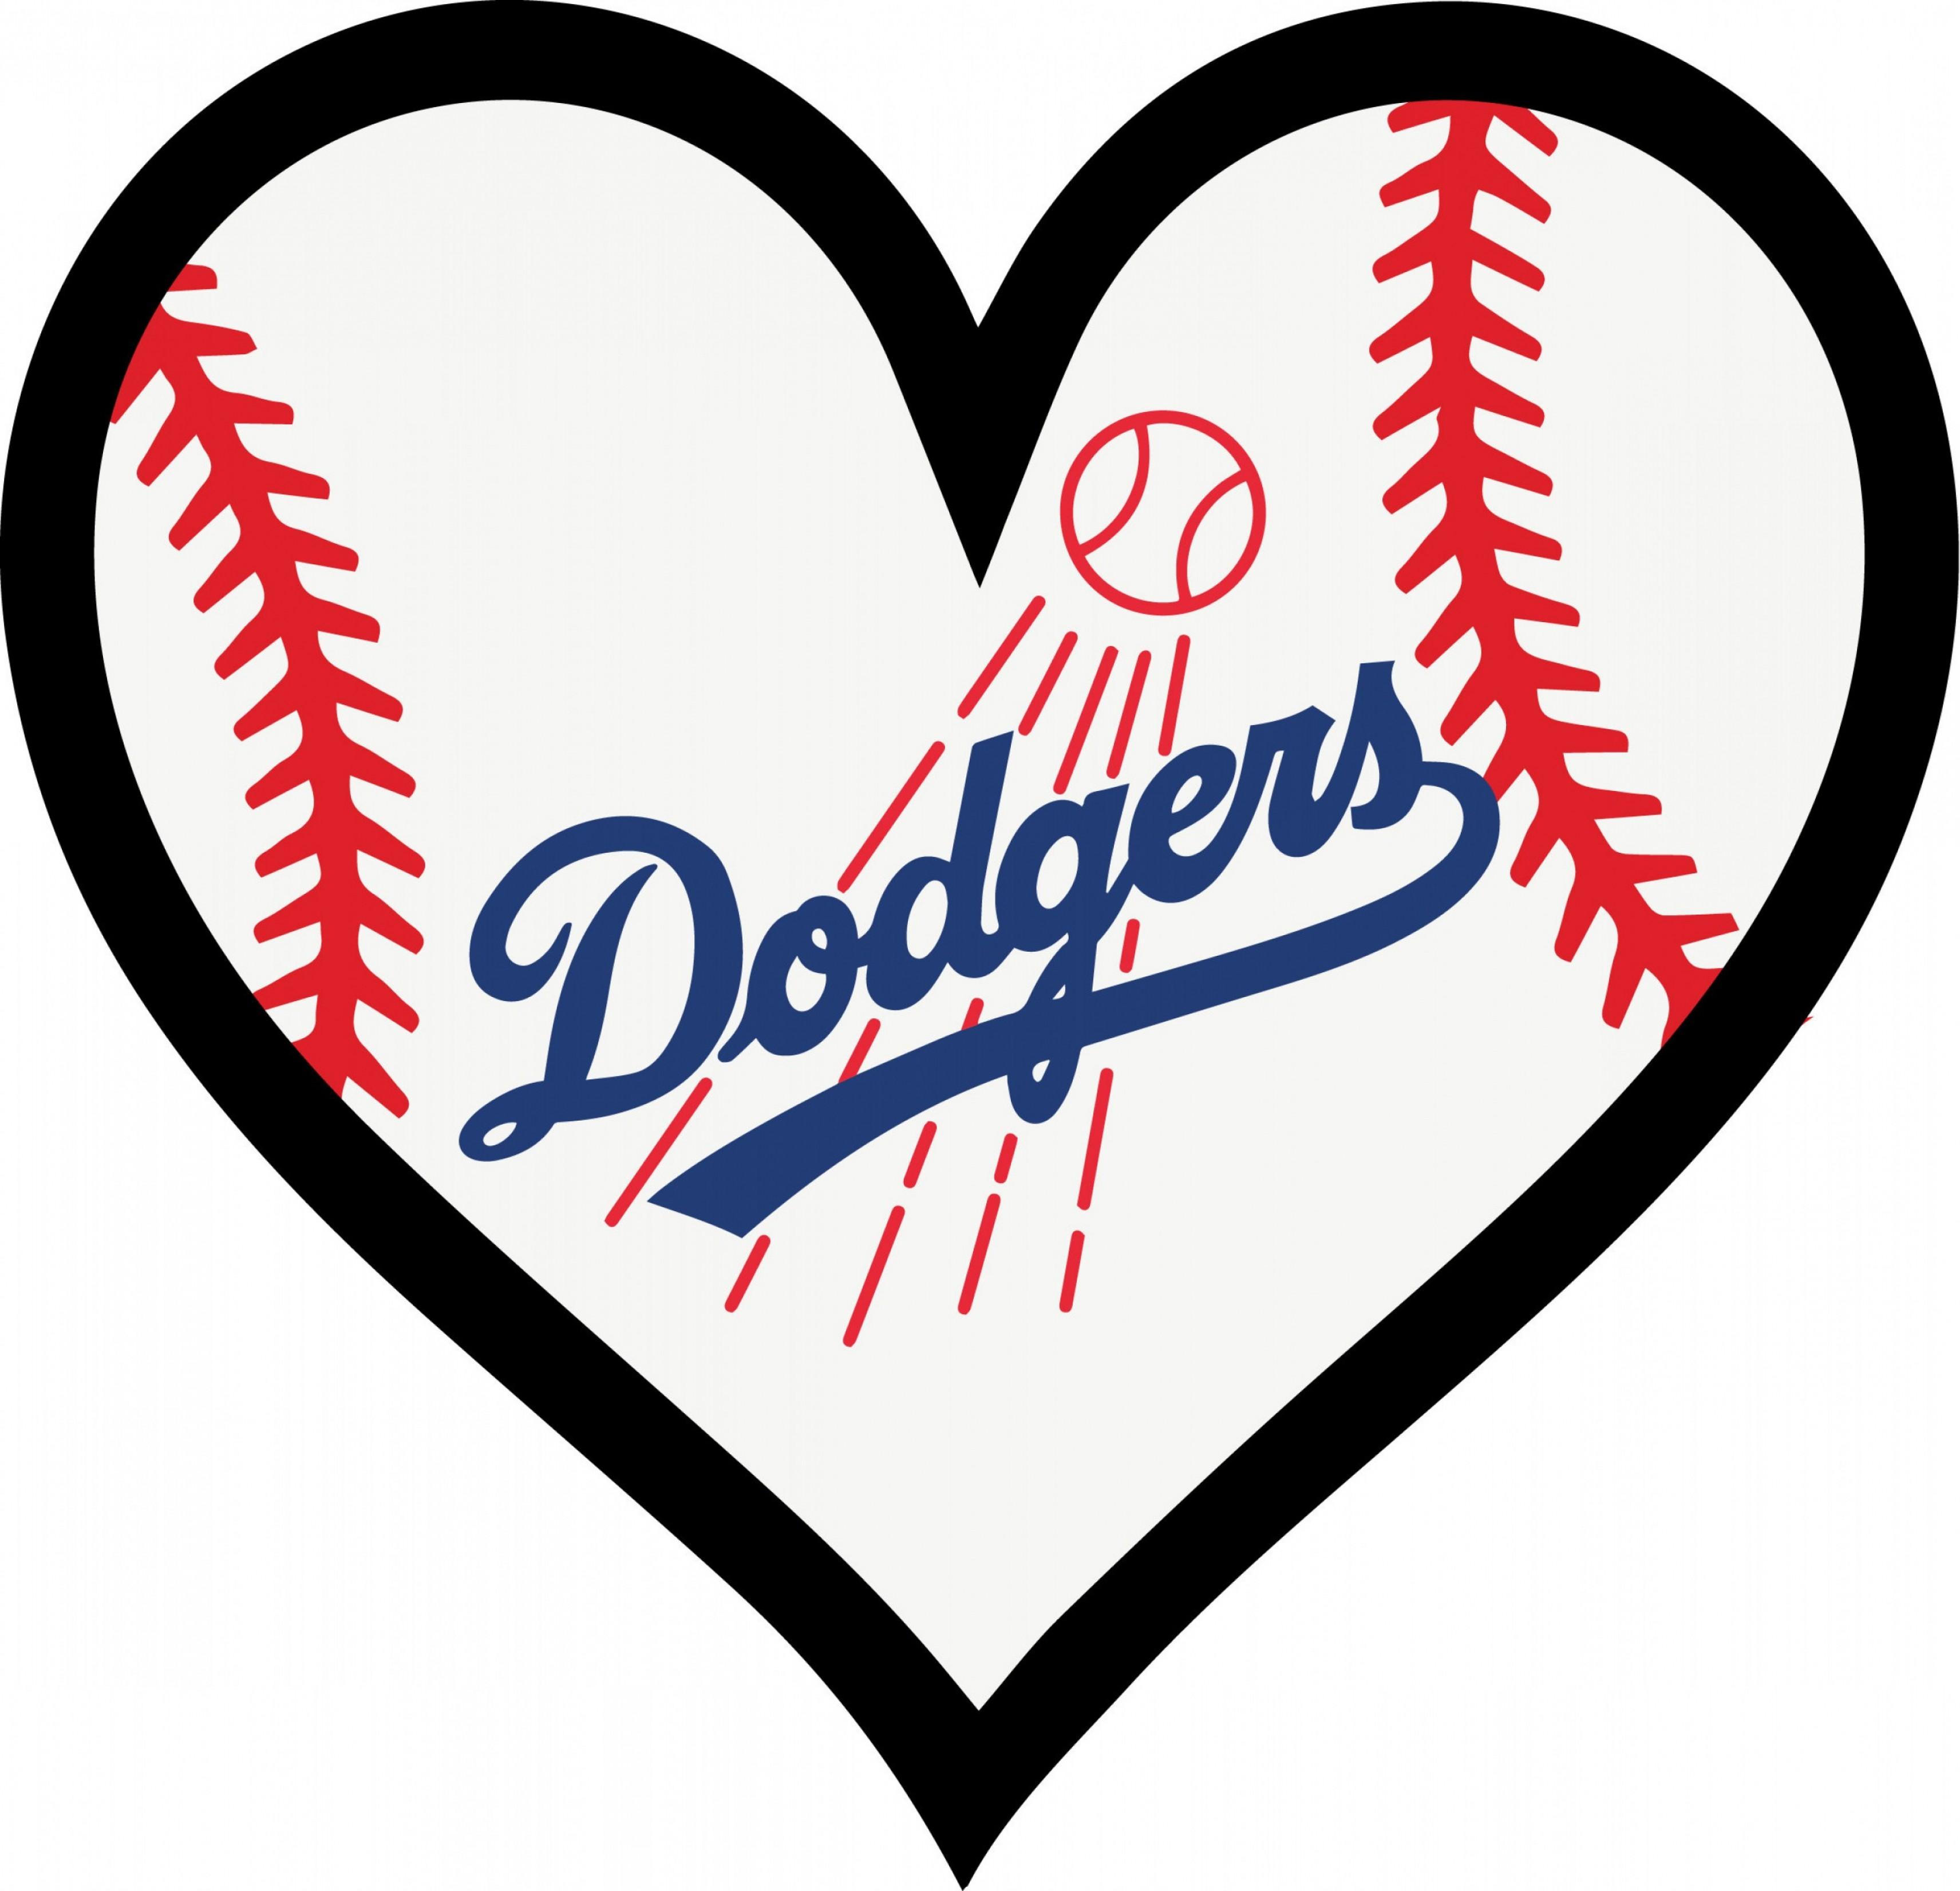 Off Los Angeles Dodgers Baseball L.